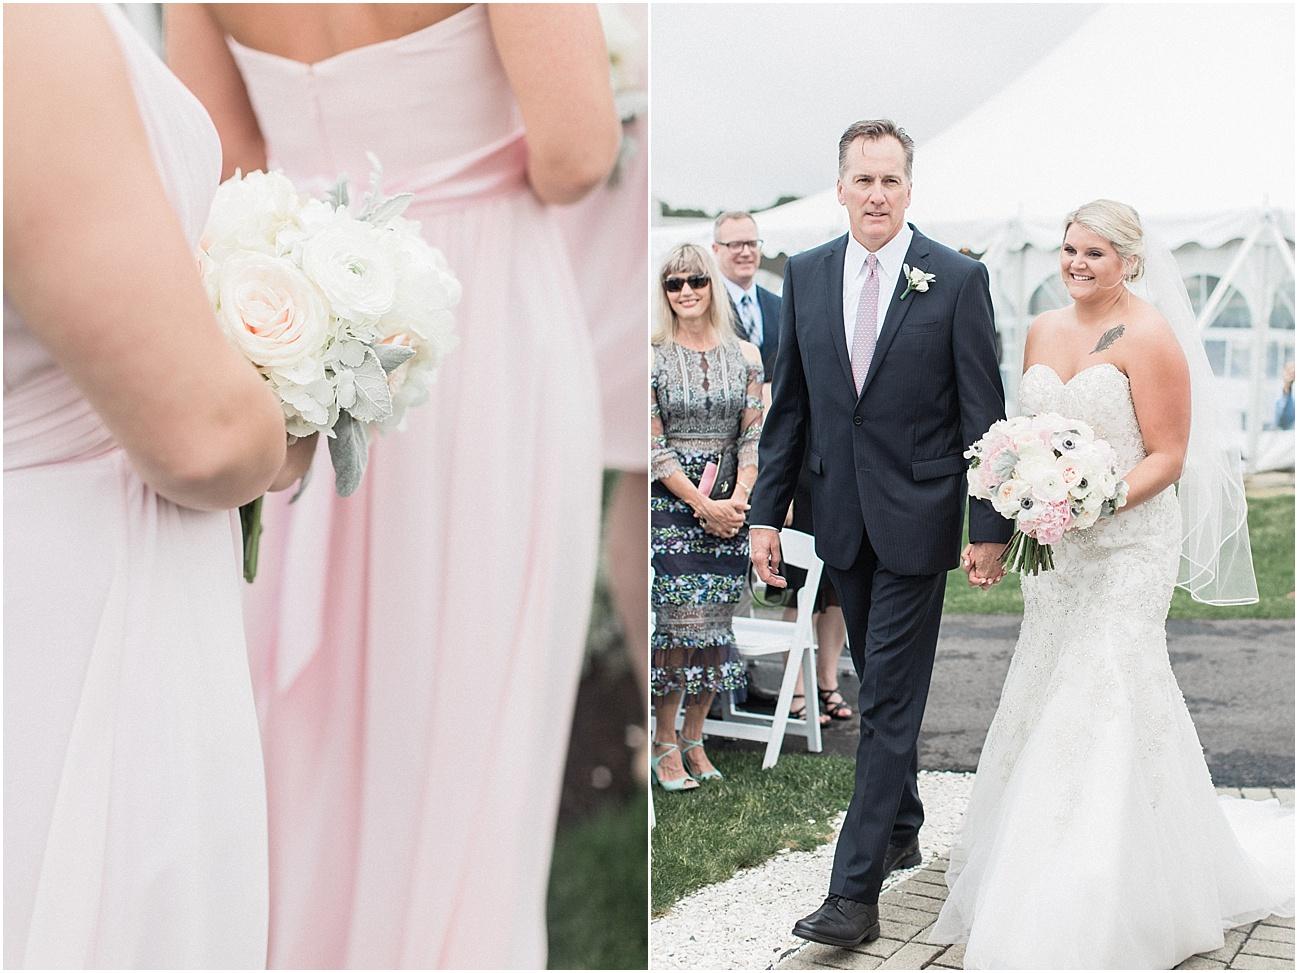 kati_bryan_maskell_white_cliffs_country_club_cape_cod_boston_wedding_photographer_meredith_jane_photography_photo_0504.jpg